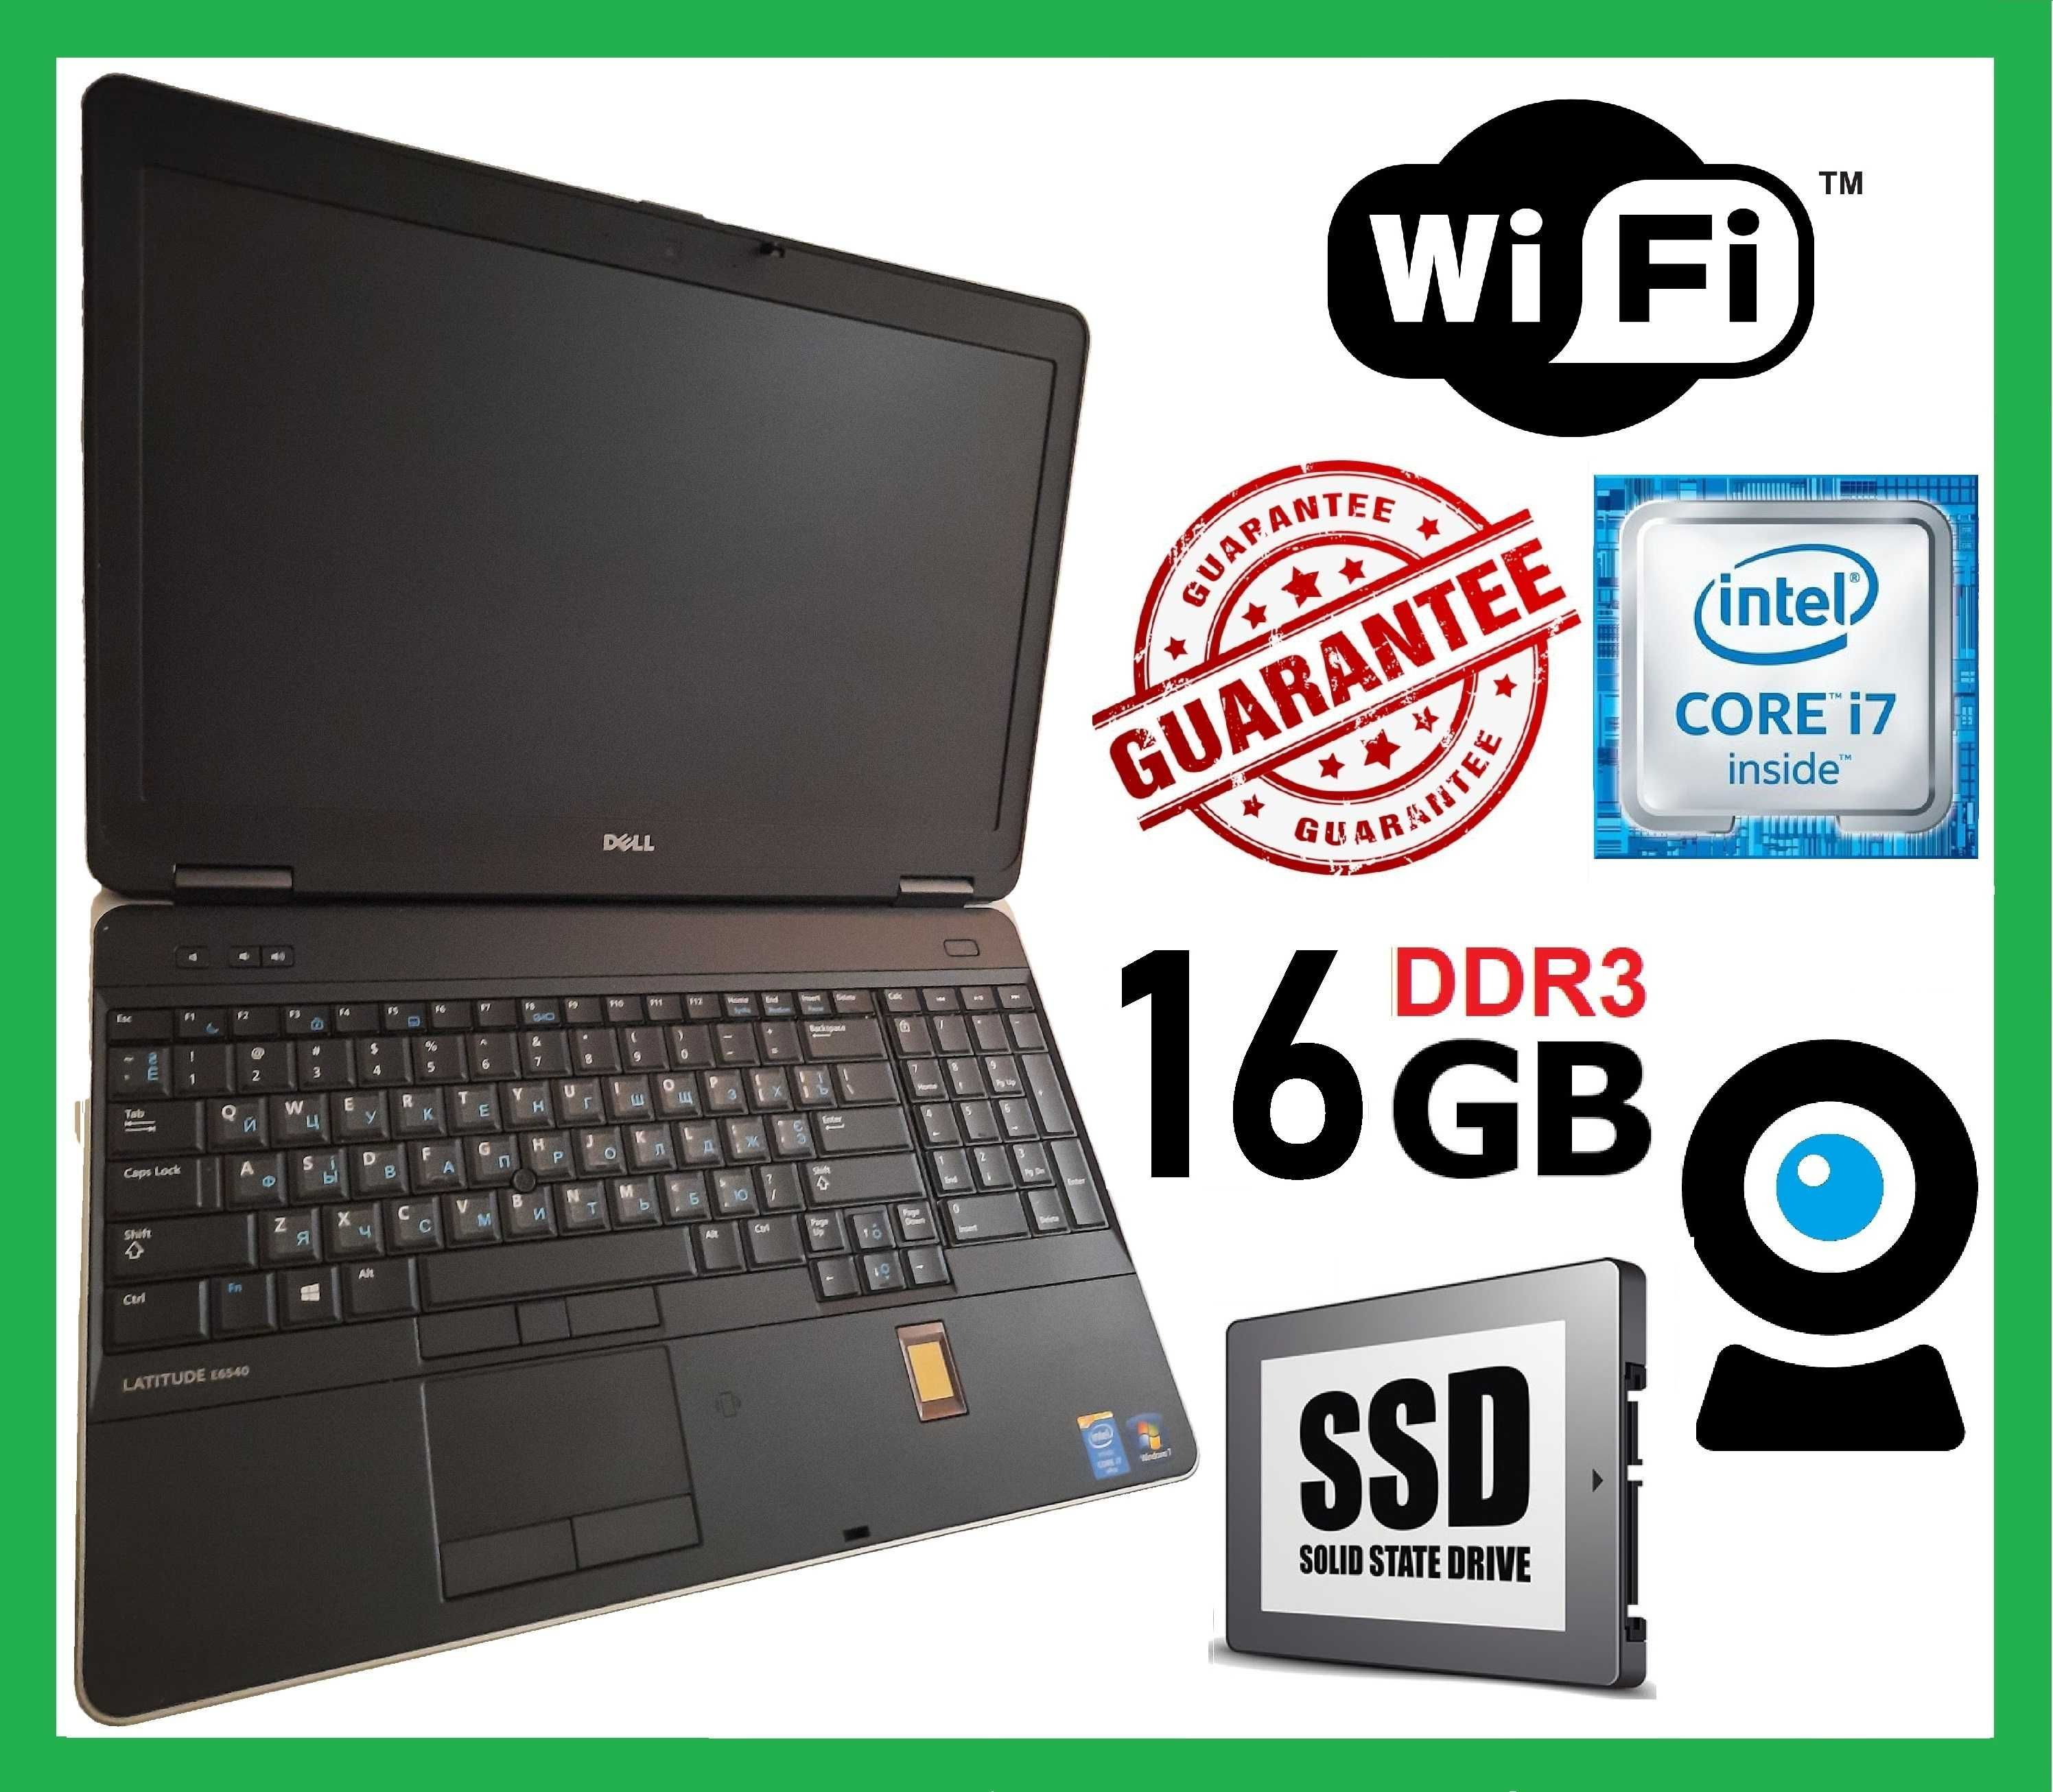 Ноутбук DELL Latitude E6540 / i7-4810MQ / 16Gb / 256Gb / 15,6''